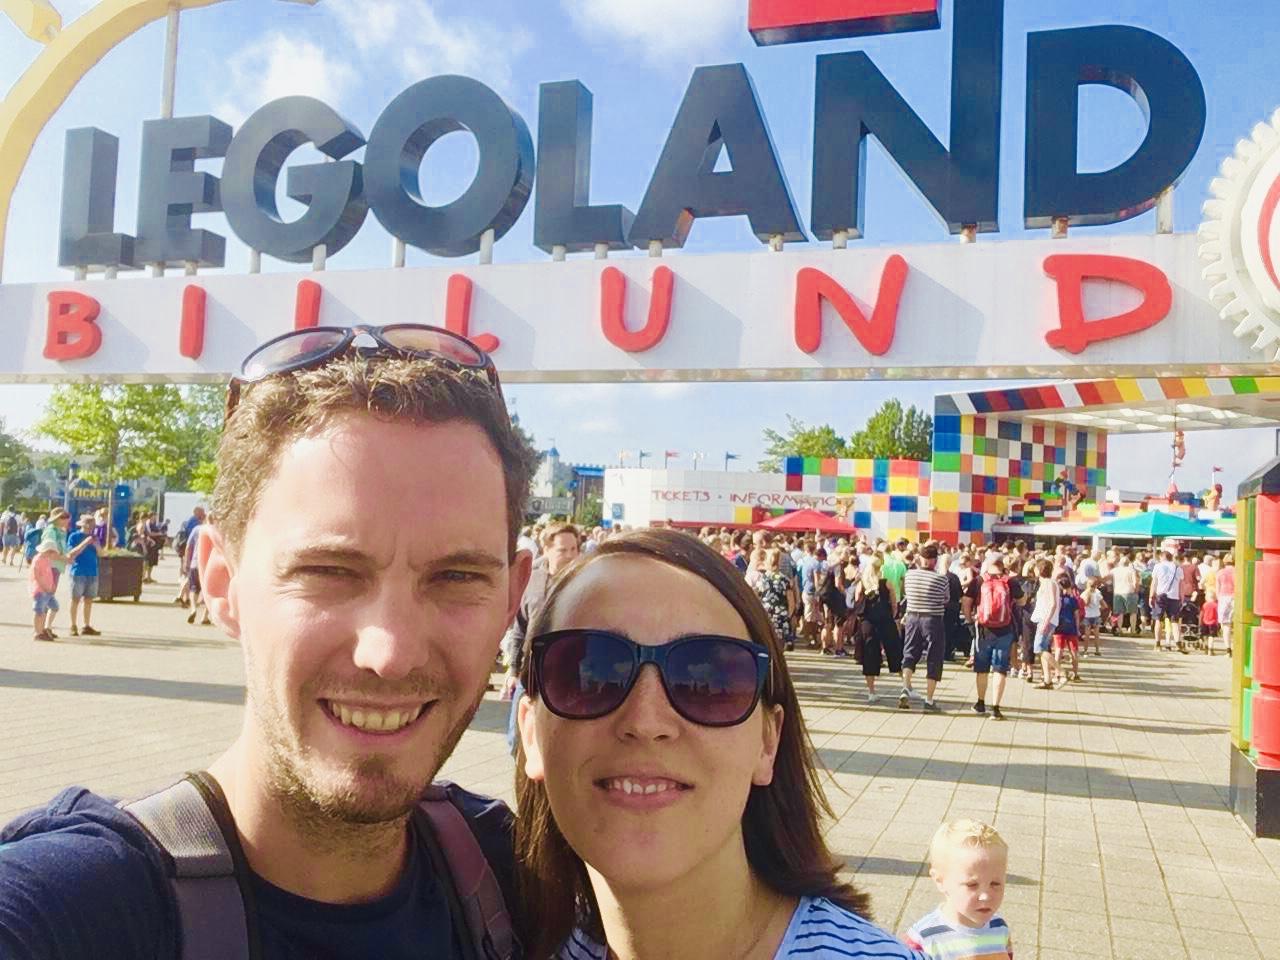 Legoland Billund: DROOMLAND?